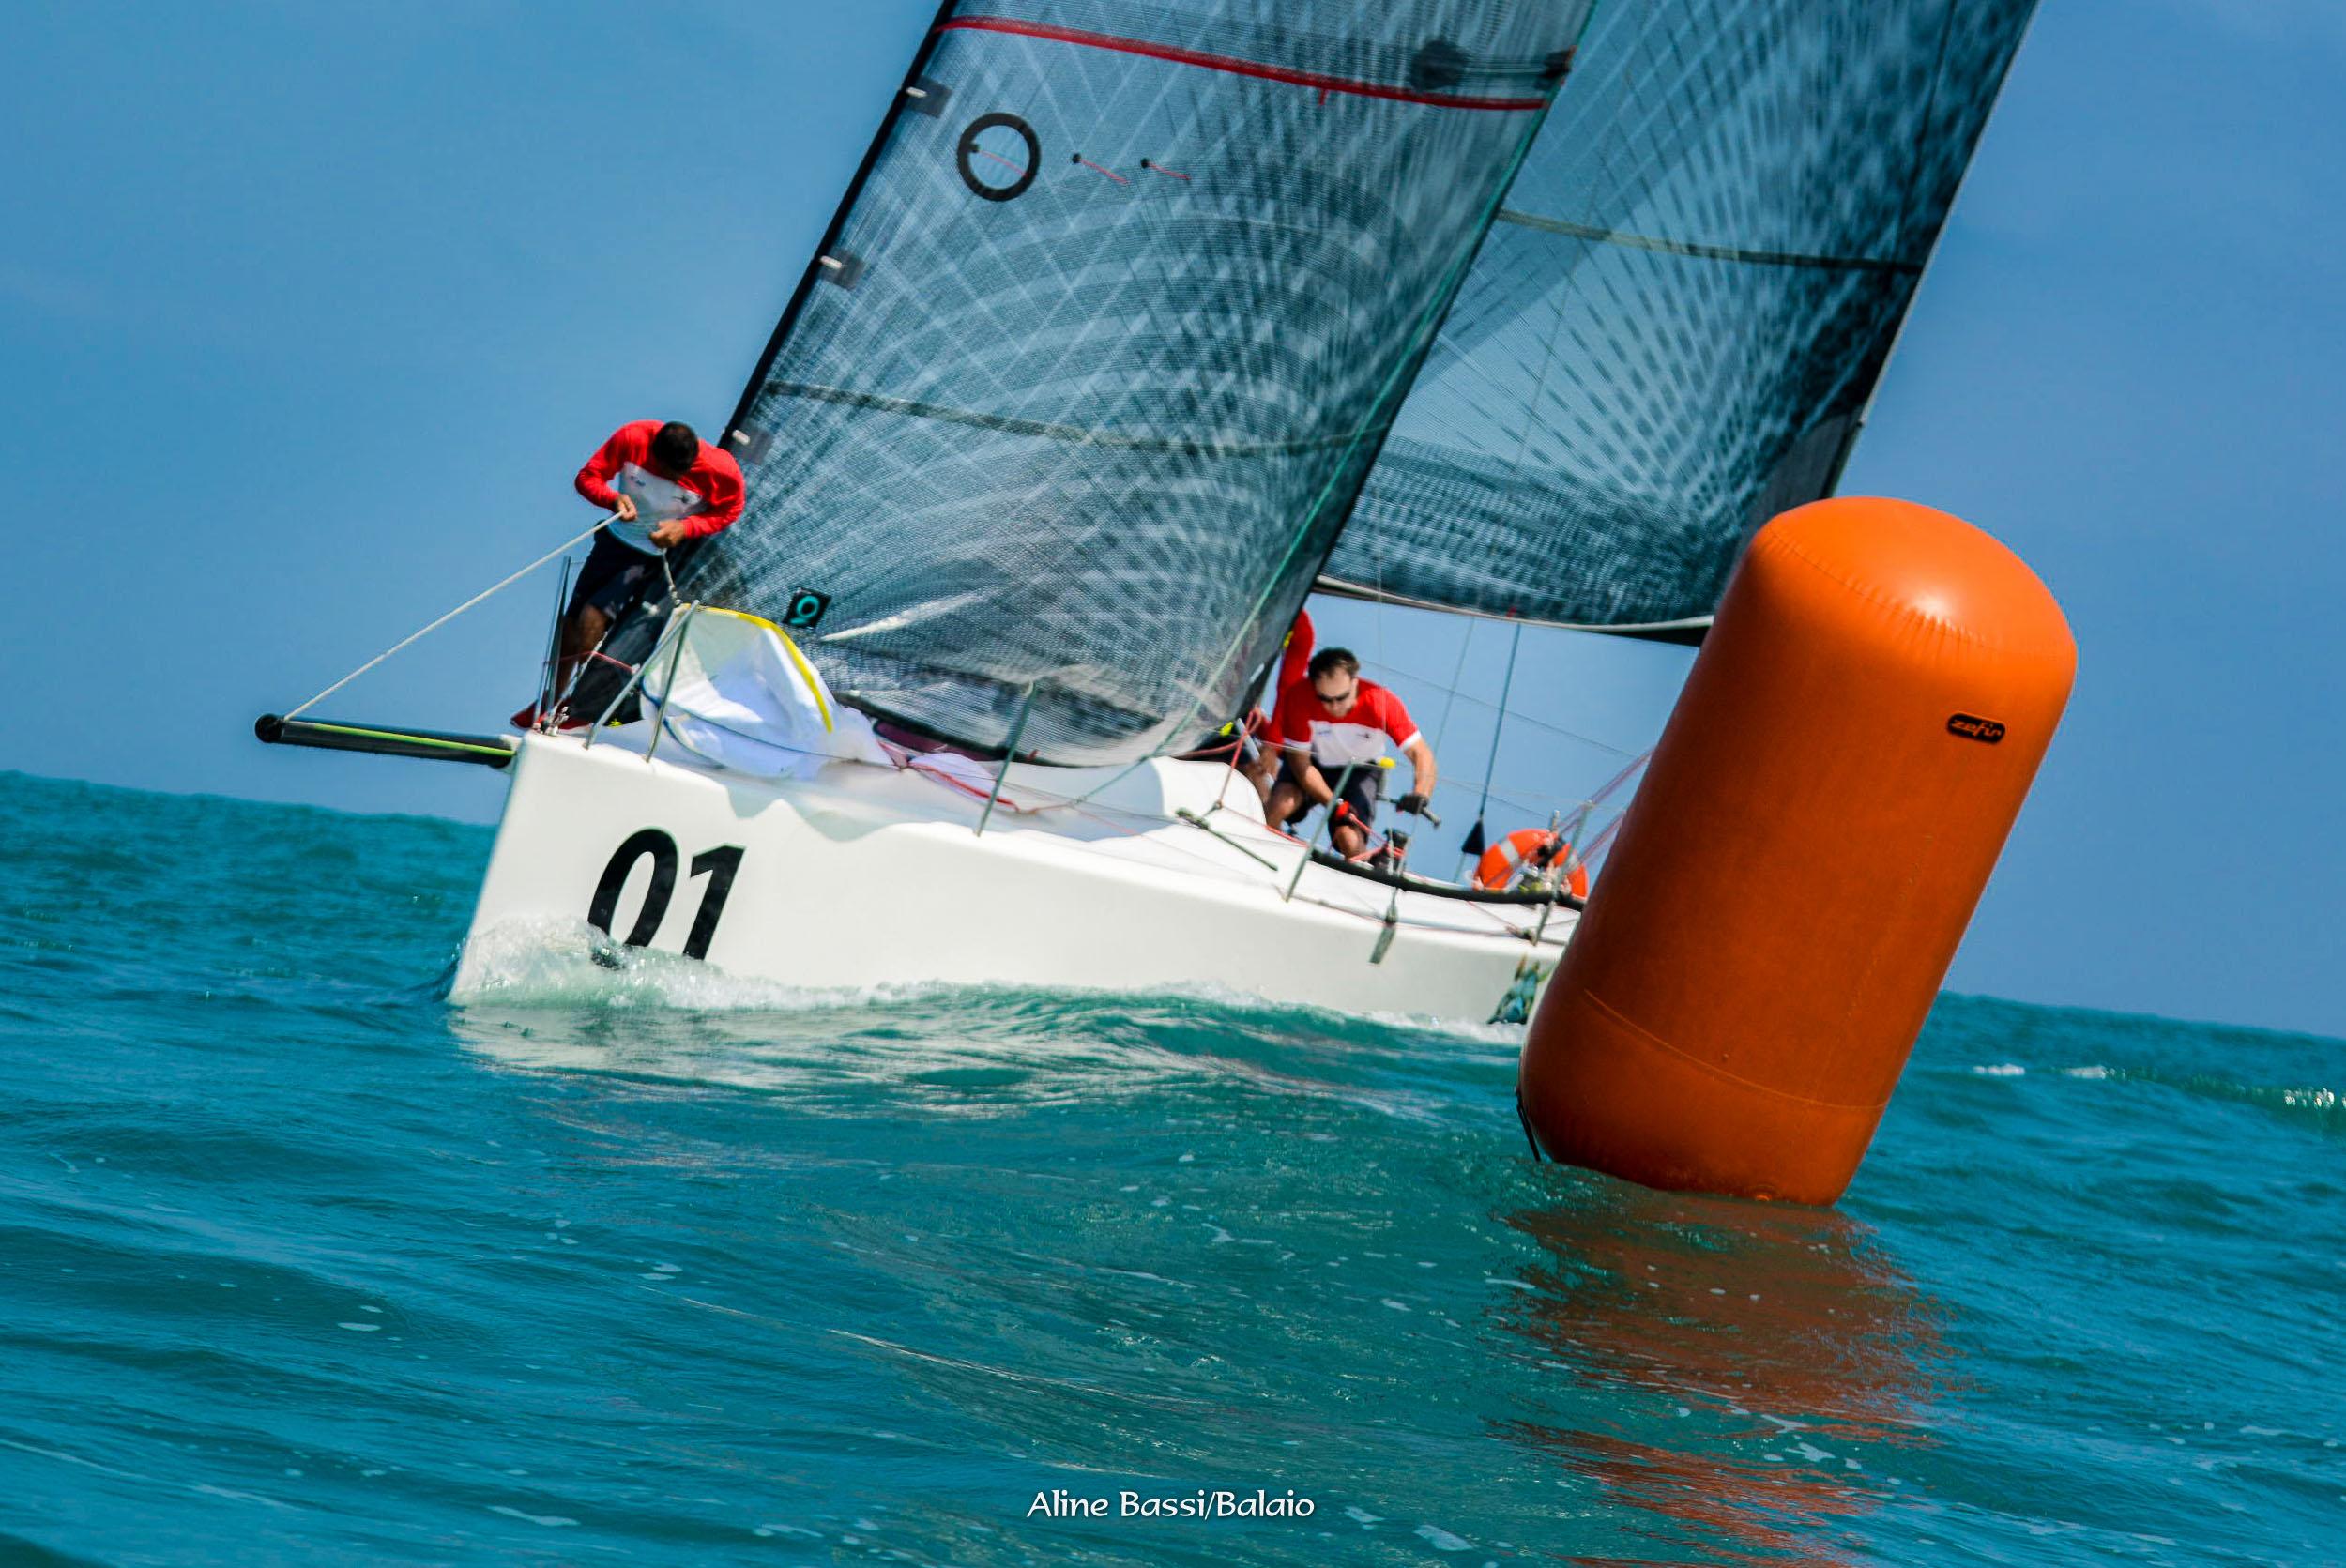 Caballo Loco (Aline Bassi Balaio de Ideias) - boat shopping